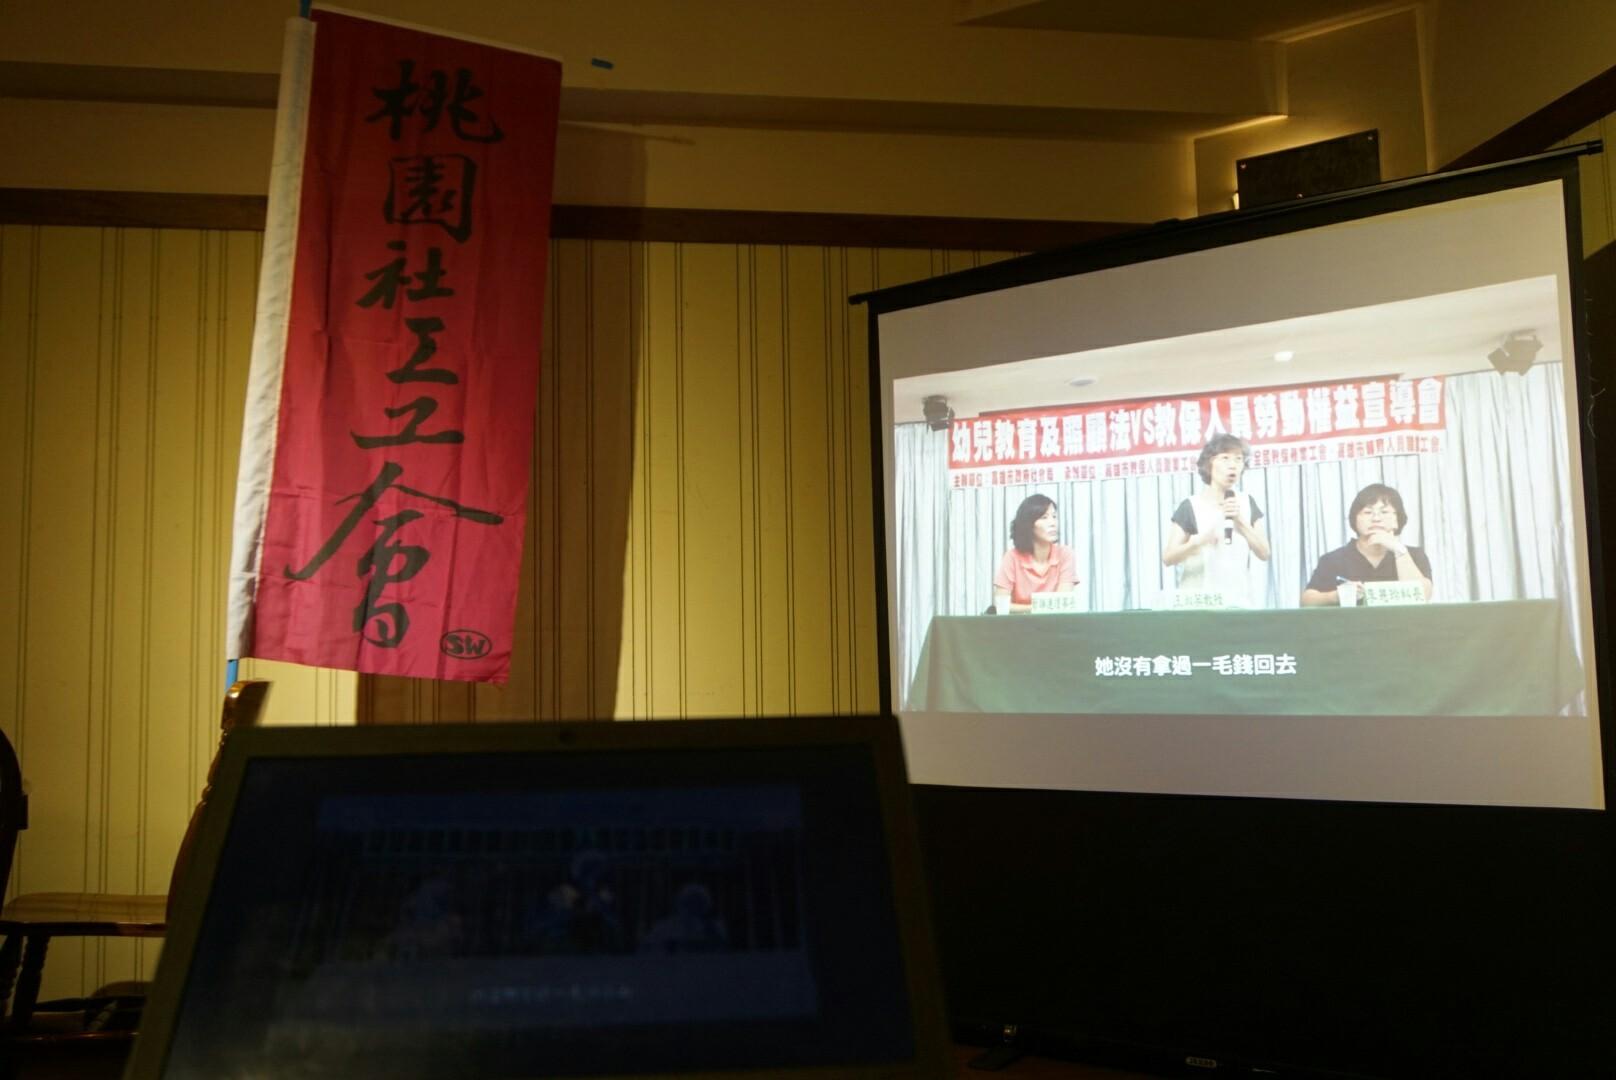 http://tw.aetutw.org/uploads/tadgallery/2018_11_12/1168_桃園社工工會_181008_0020.jpg